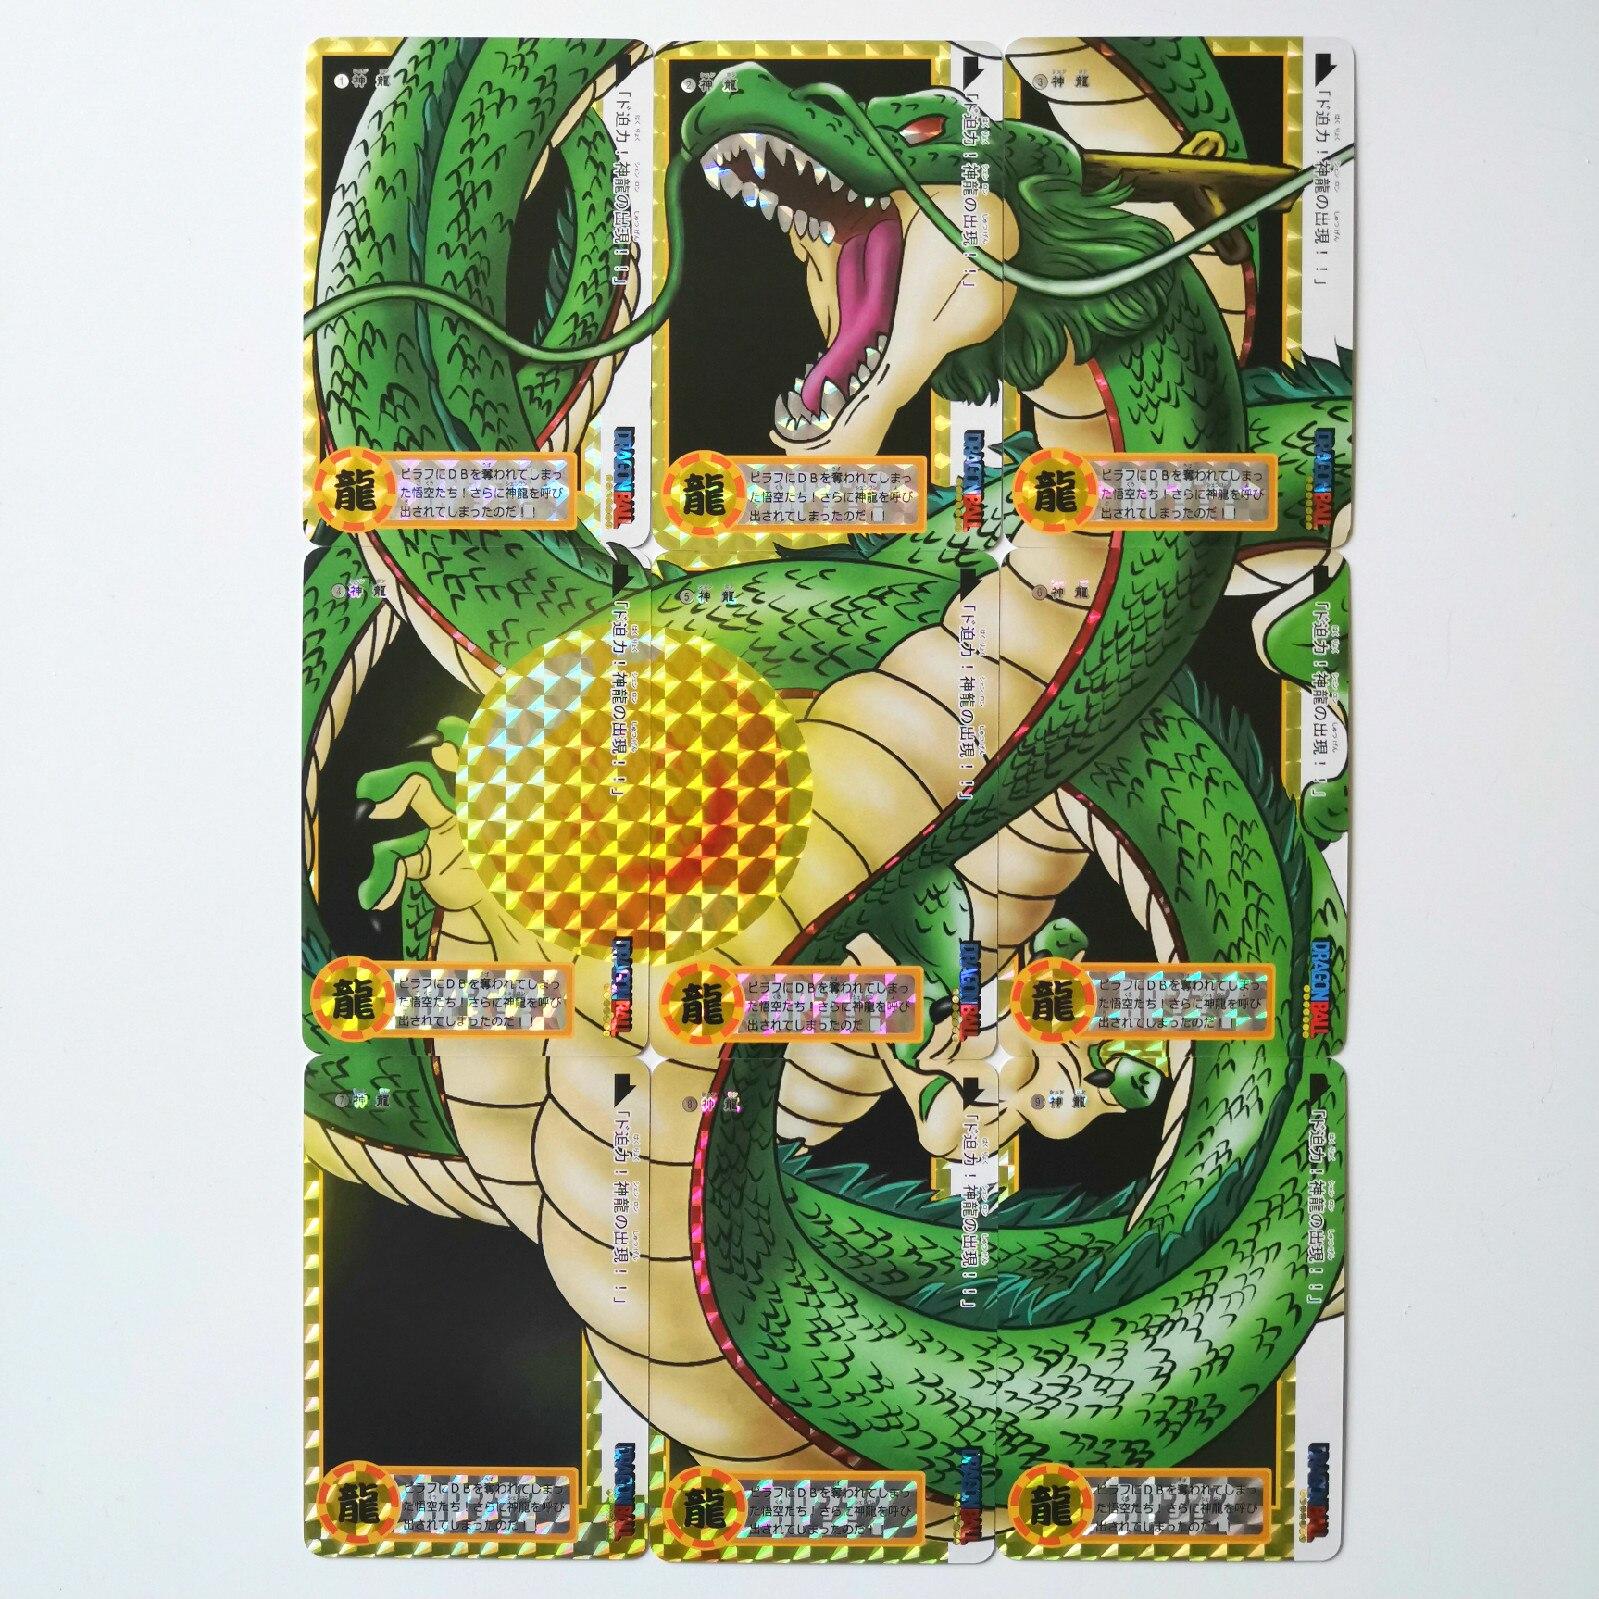 9pcs Shenron 9 In 1 Super Dragon Ball Z Heroes Battle Card Ultra Instinct Goku Vegeta Game Collection Cards